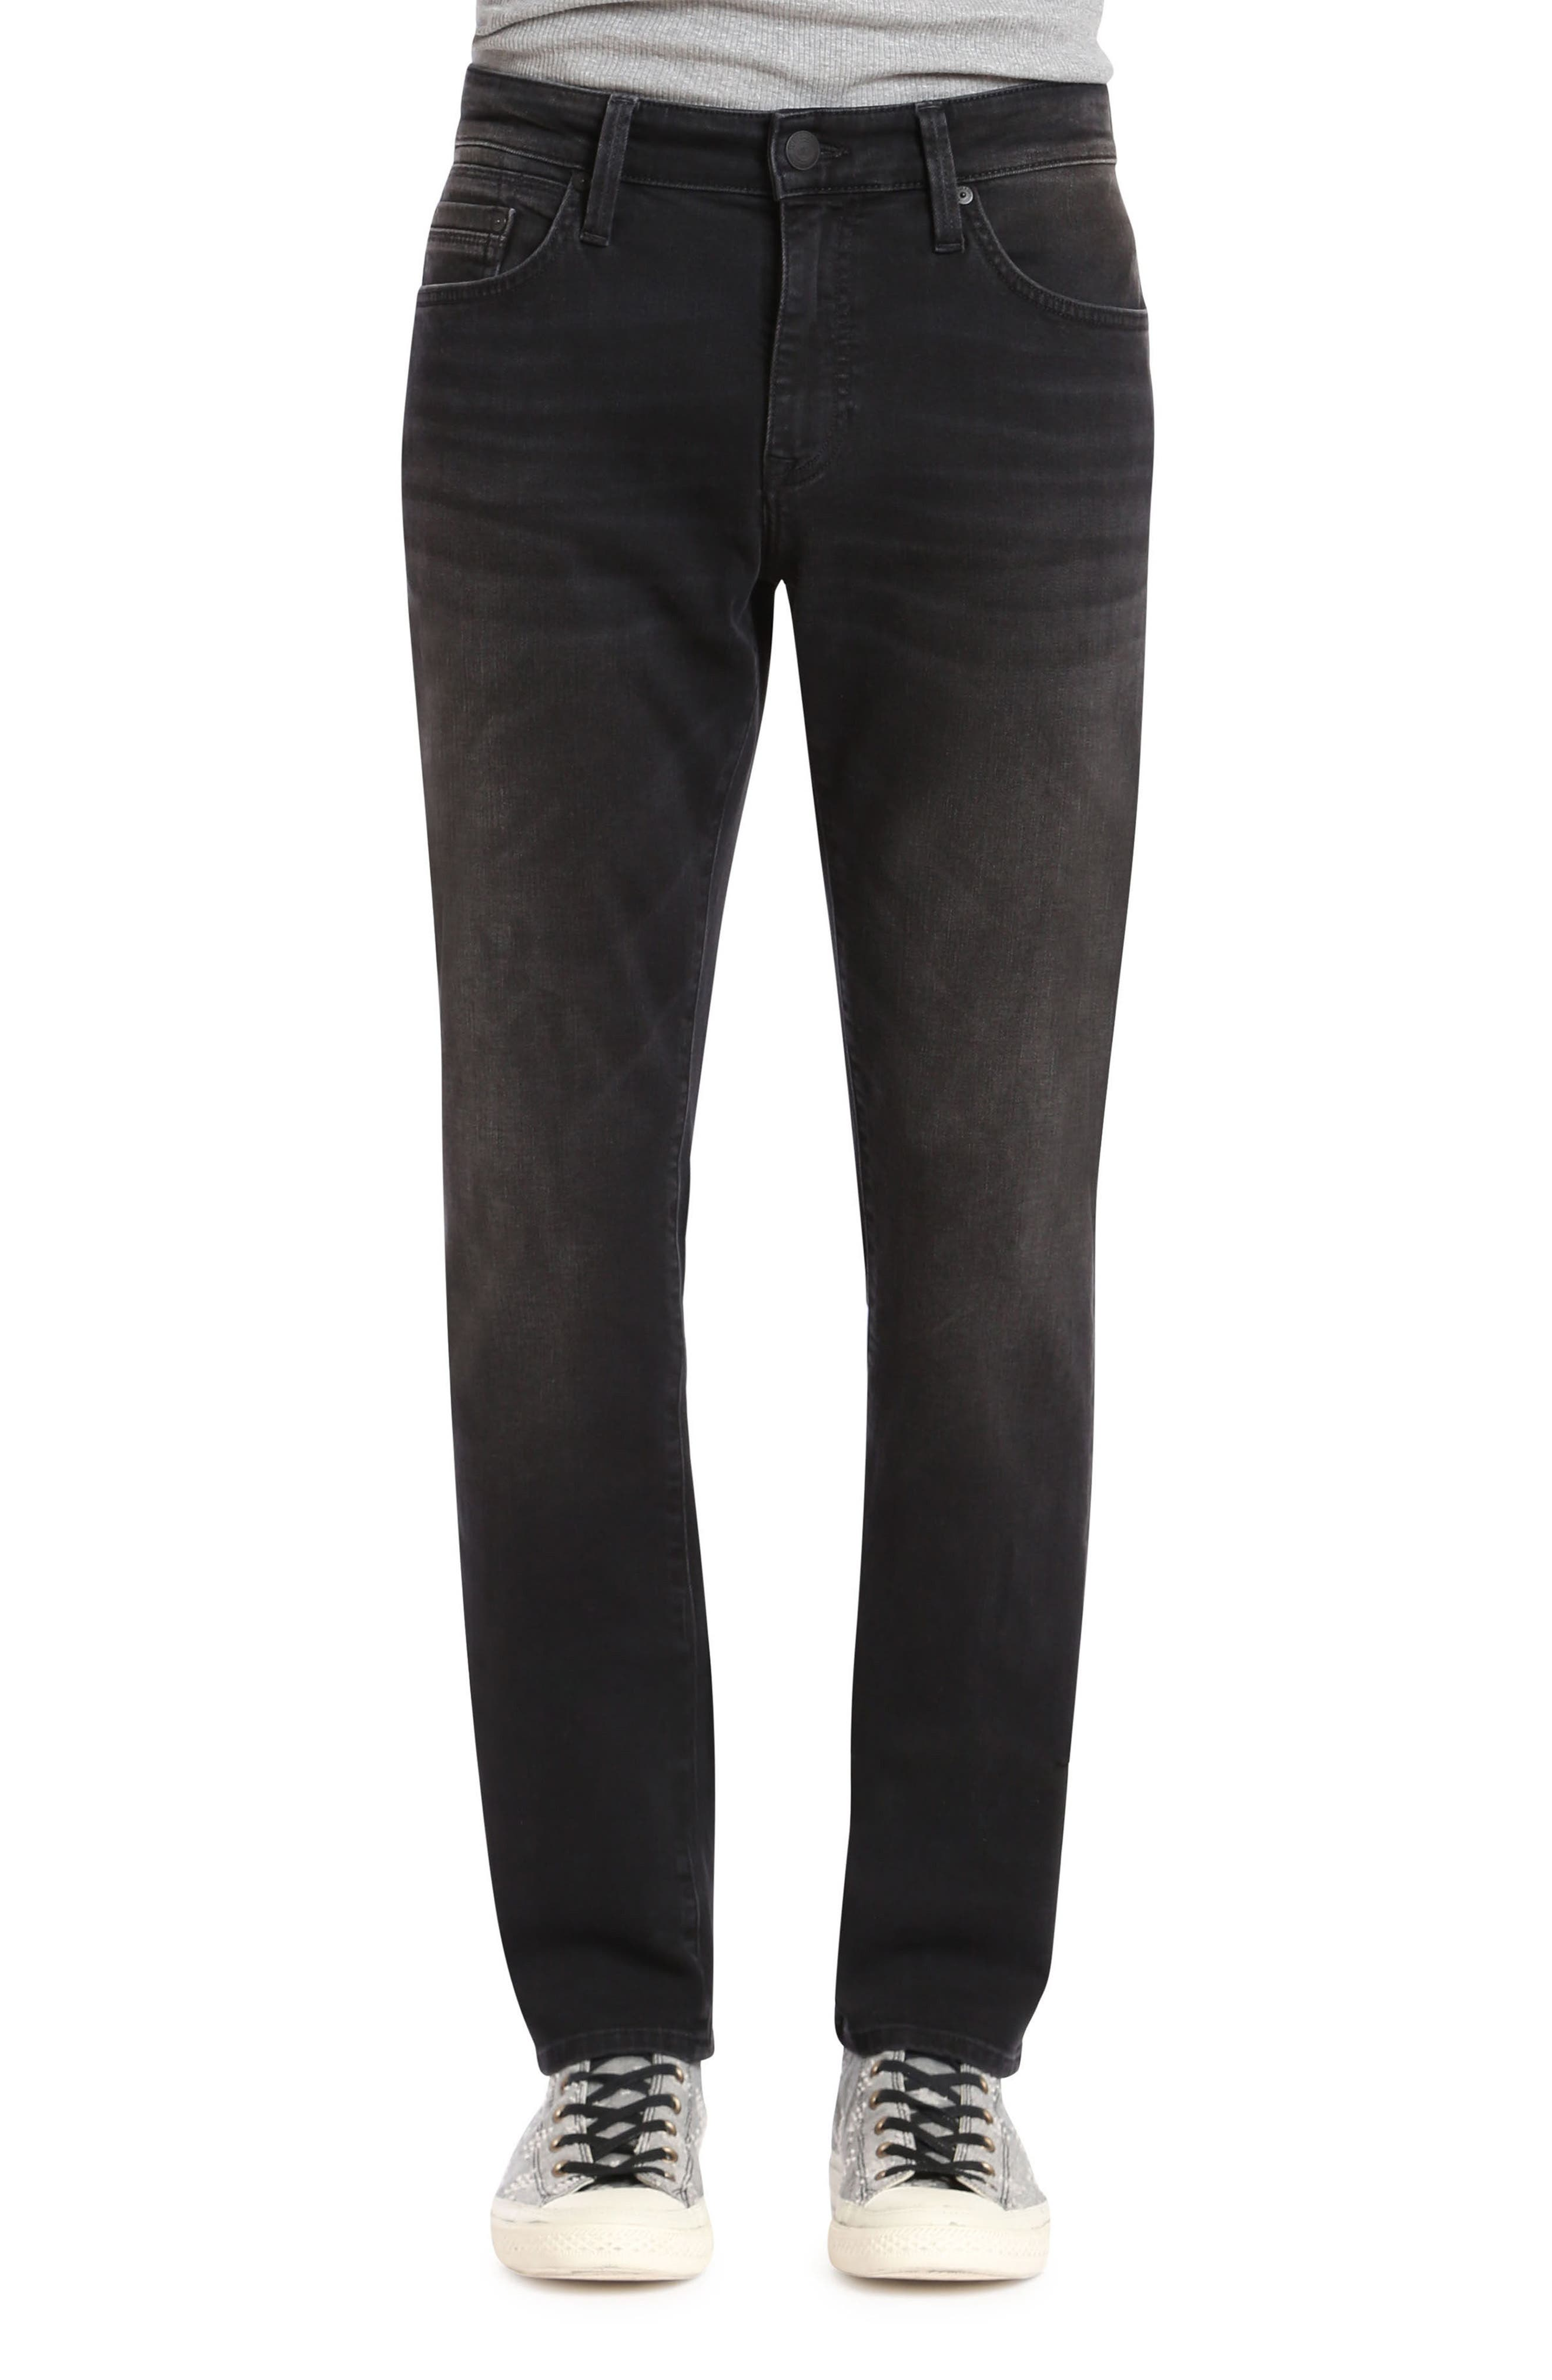 Marcus Slim Straight Leg Jeans,                             Main thumbnail 1, color,                             Dark Smoke Williamsburg